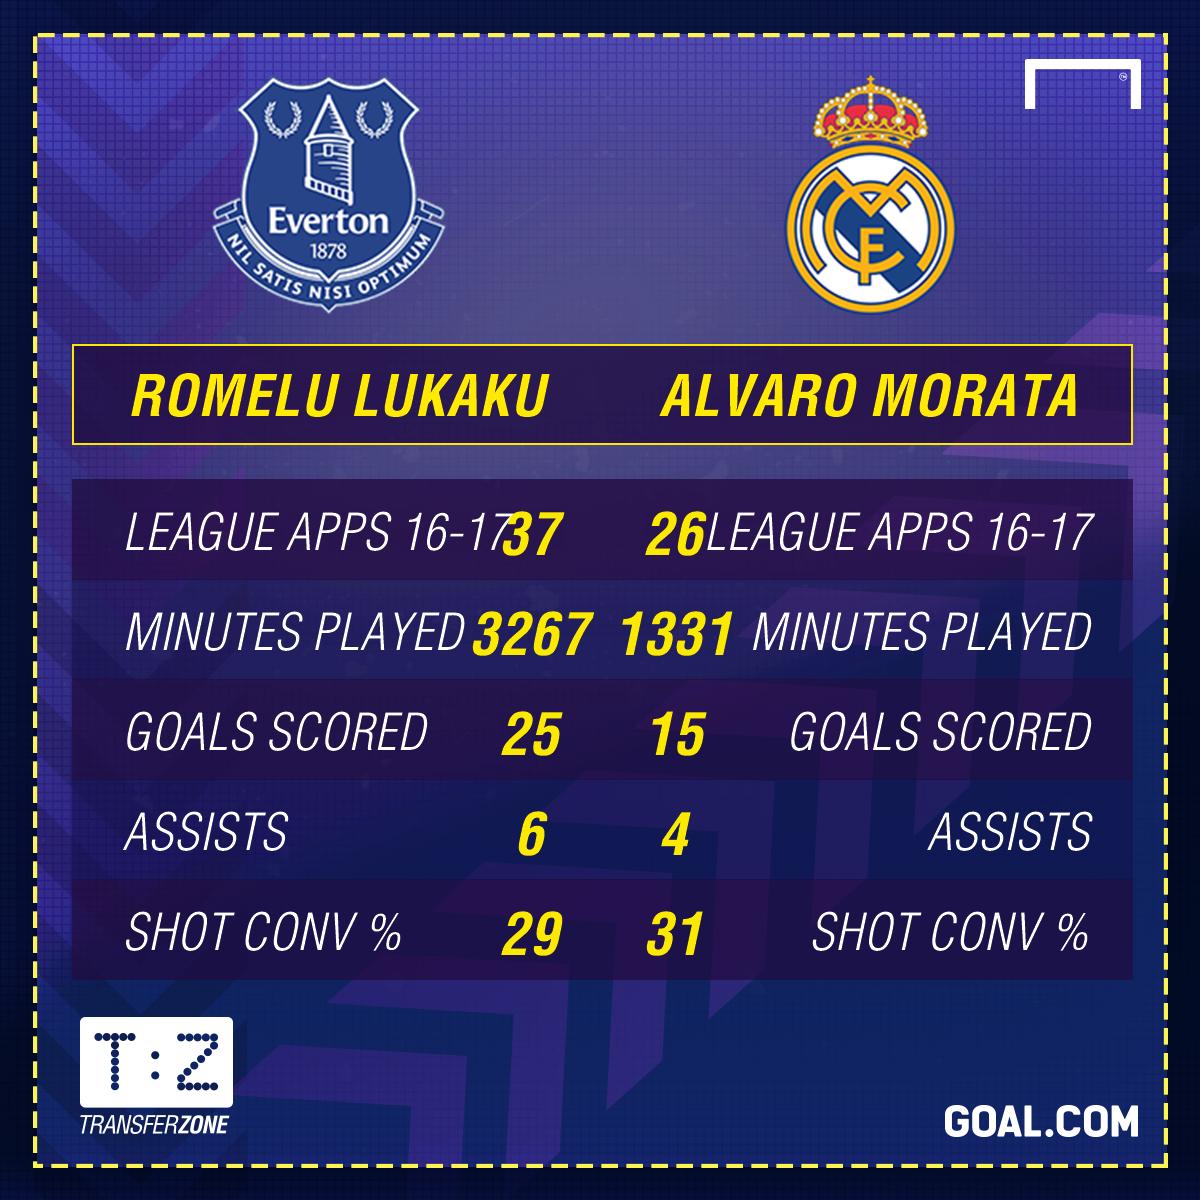 Lukaku Morata comparison